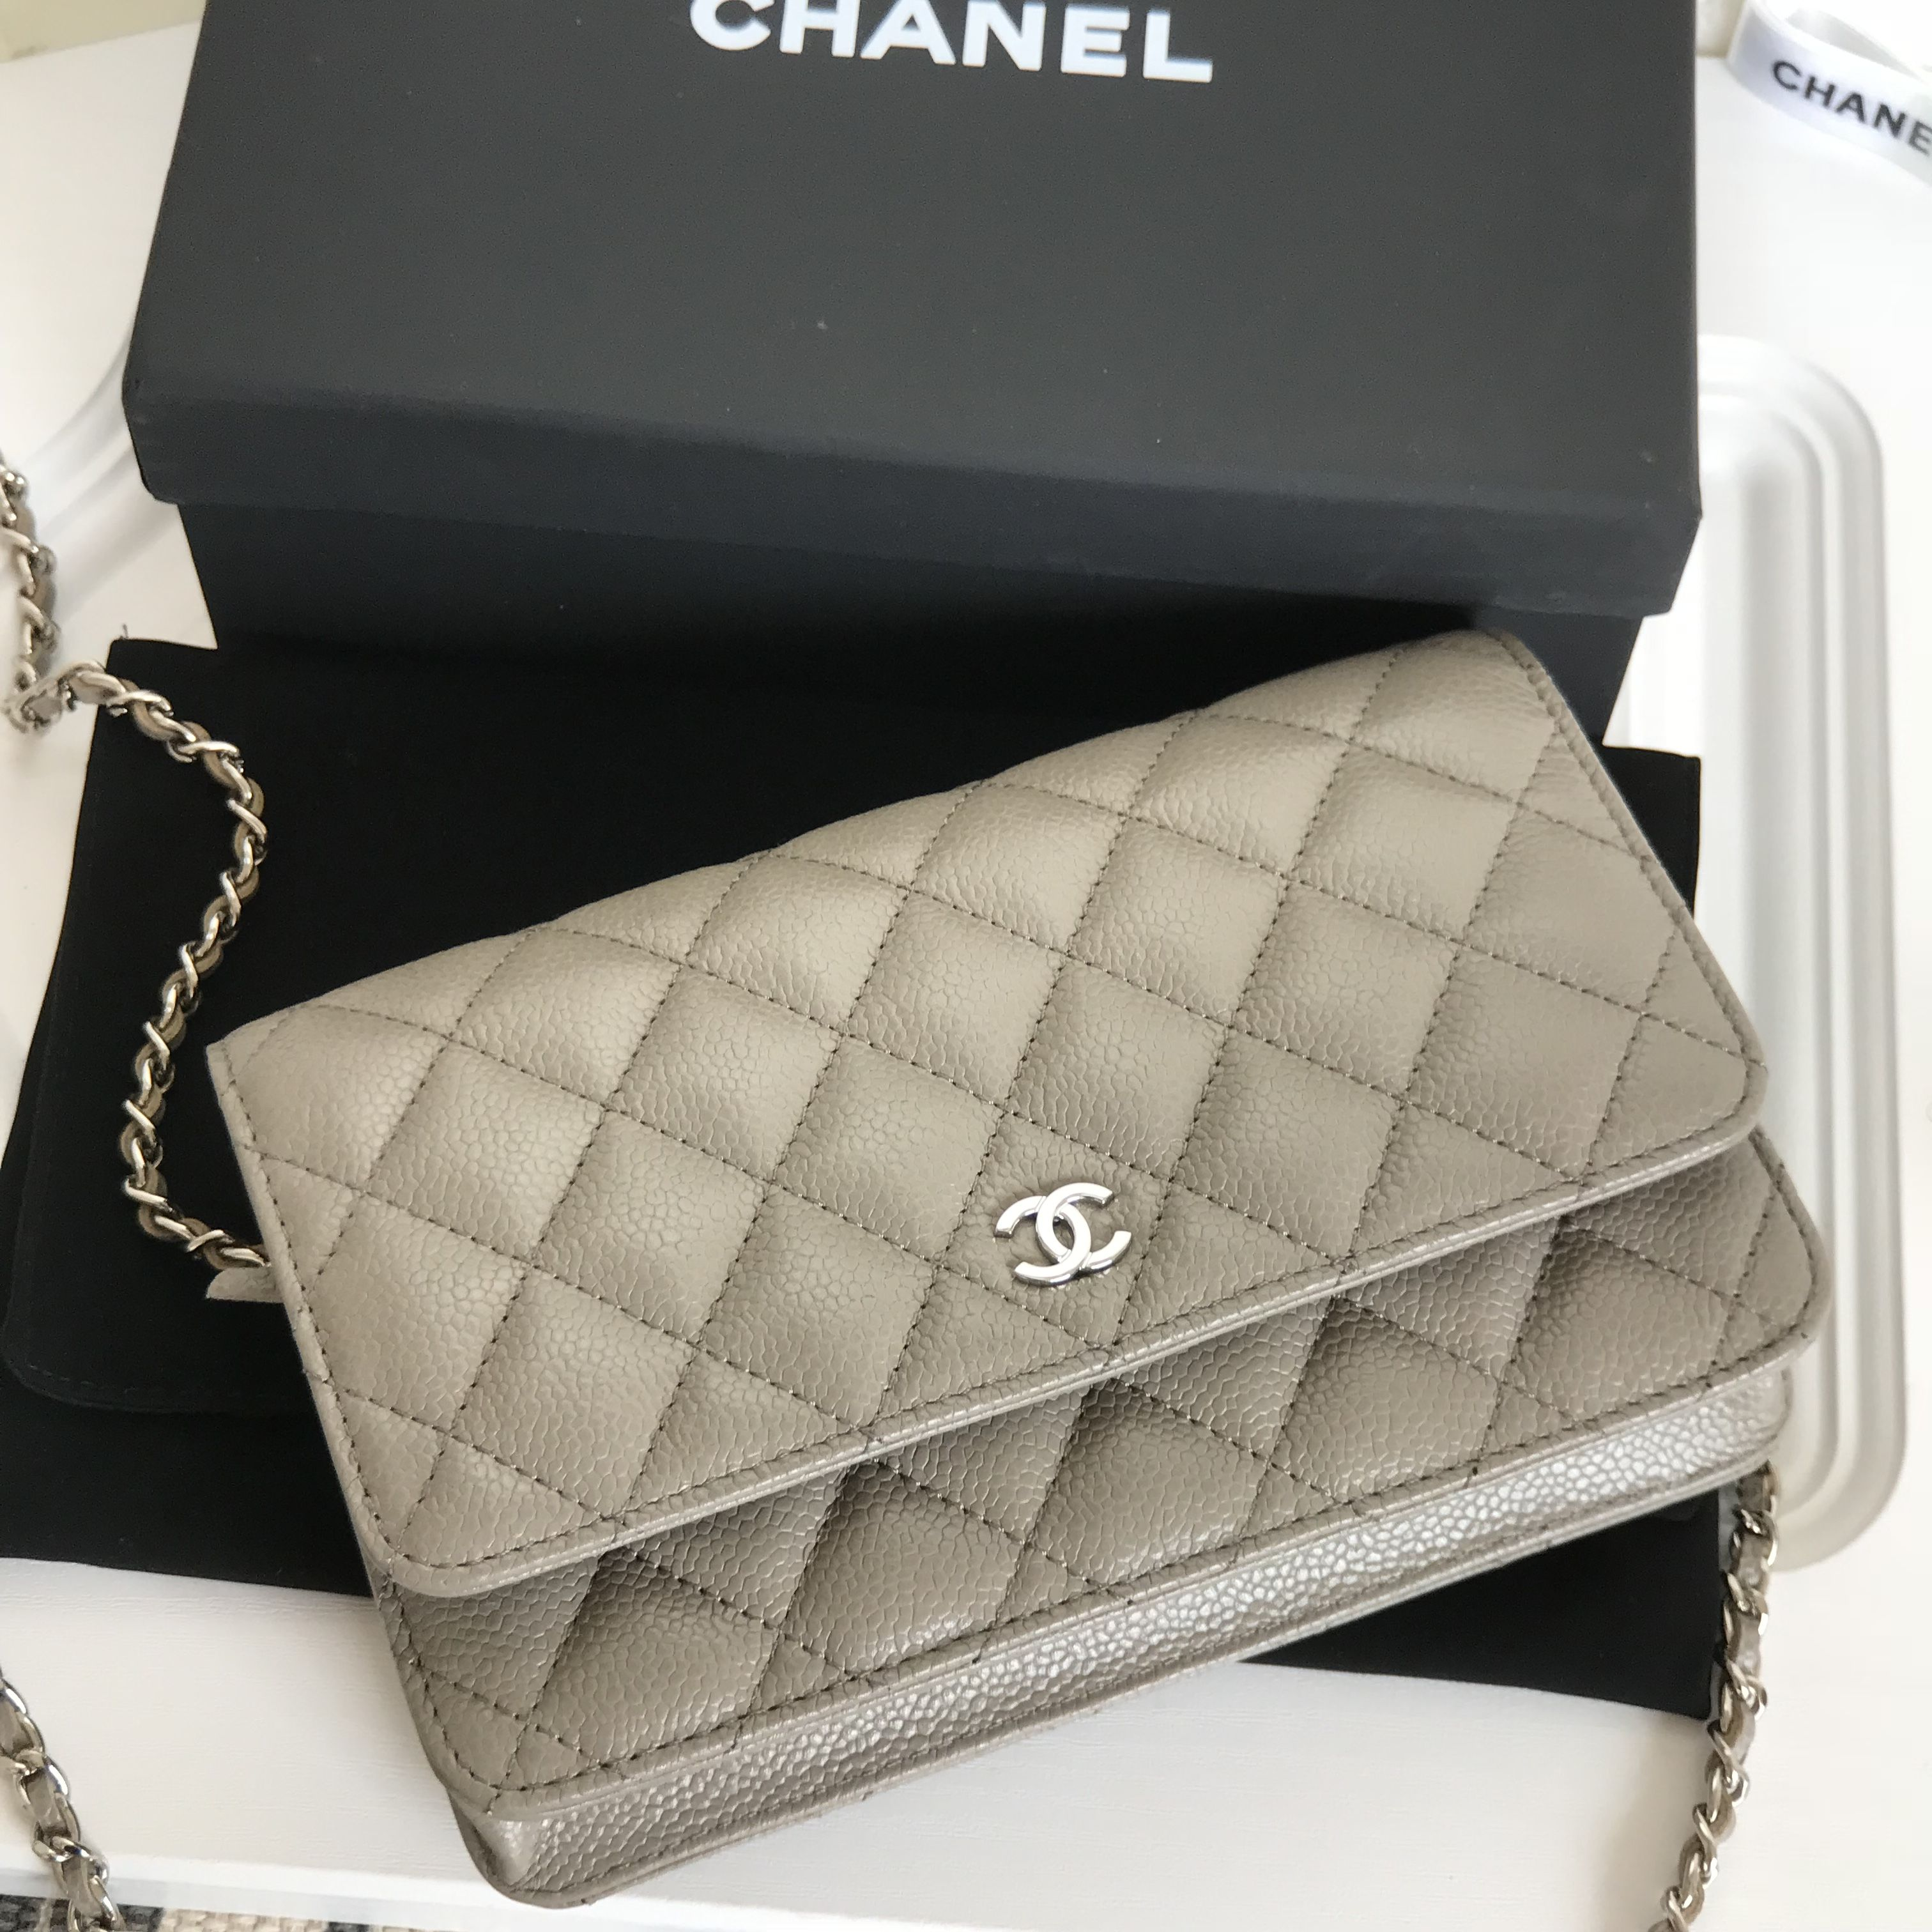 85bb79e21 Chanel gray caviar WOC wallet of chain original leather version ...